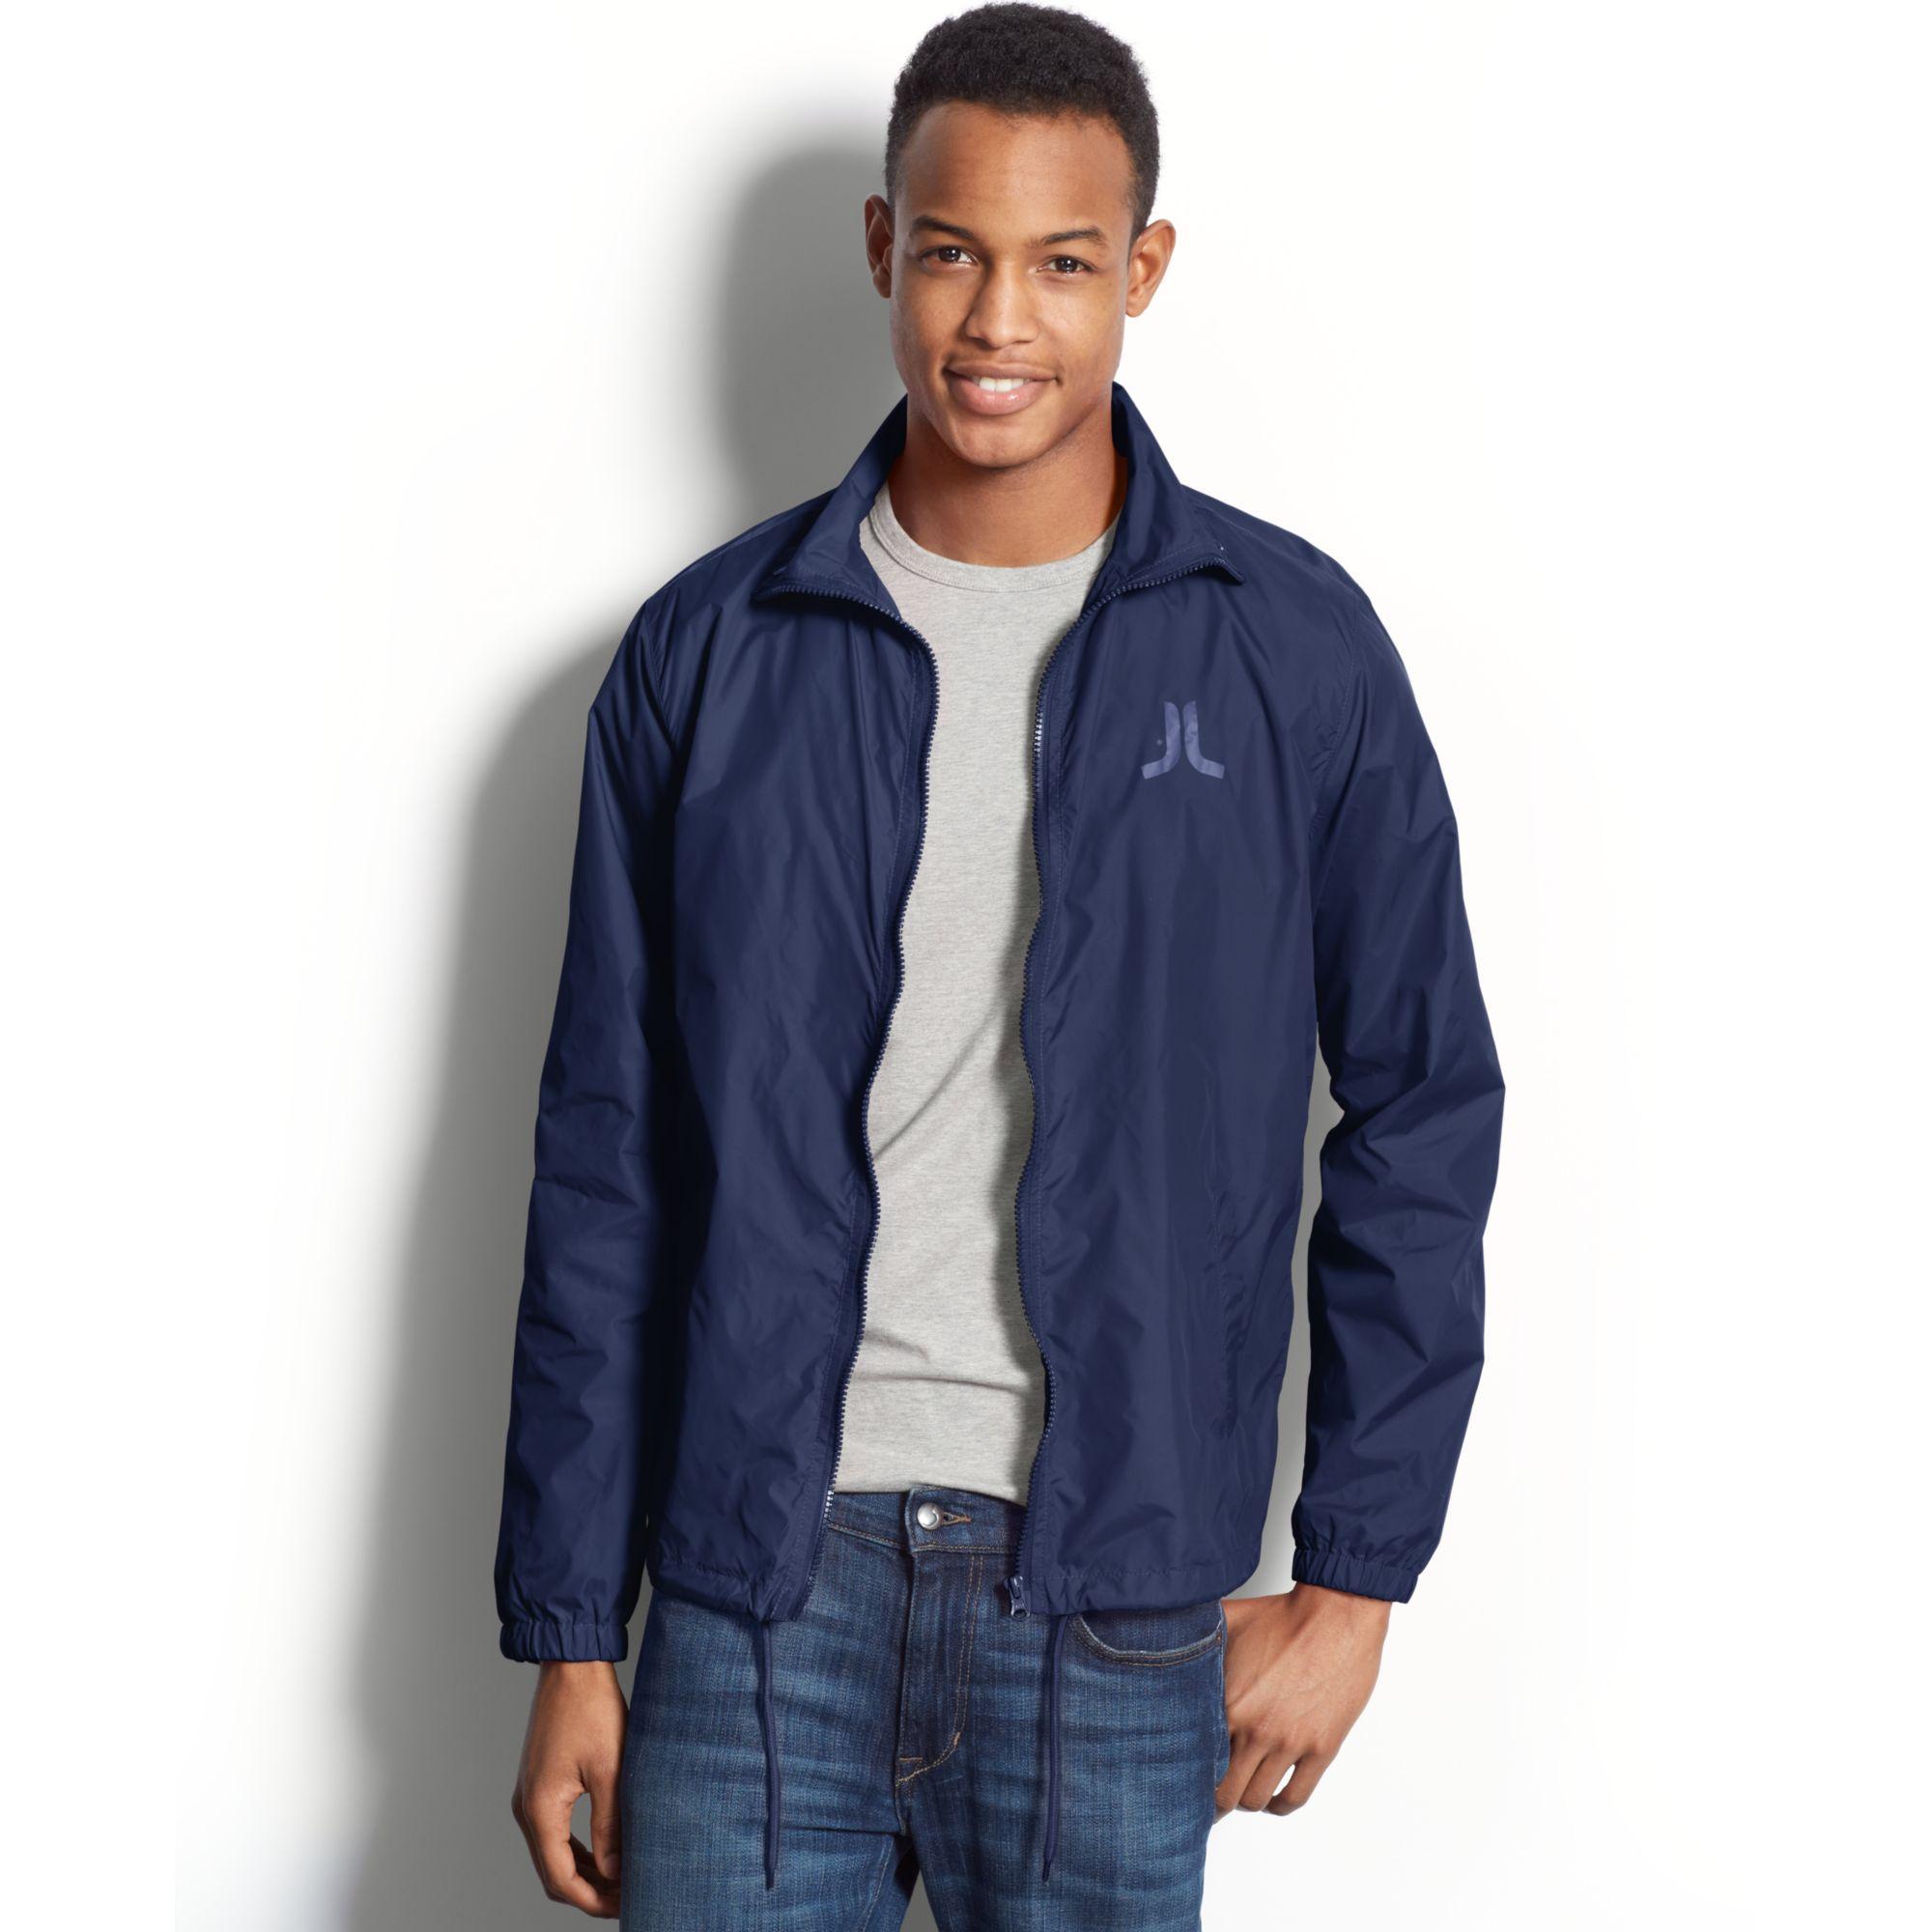 Shop for the hottest Designer Jackets for Men at International Jock. FAST, FREE SHIPPING & EASY RETURNS.